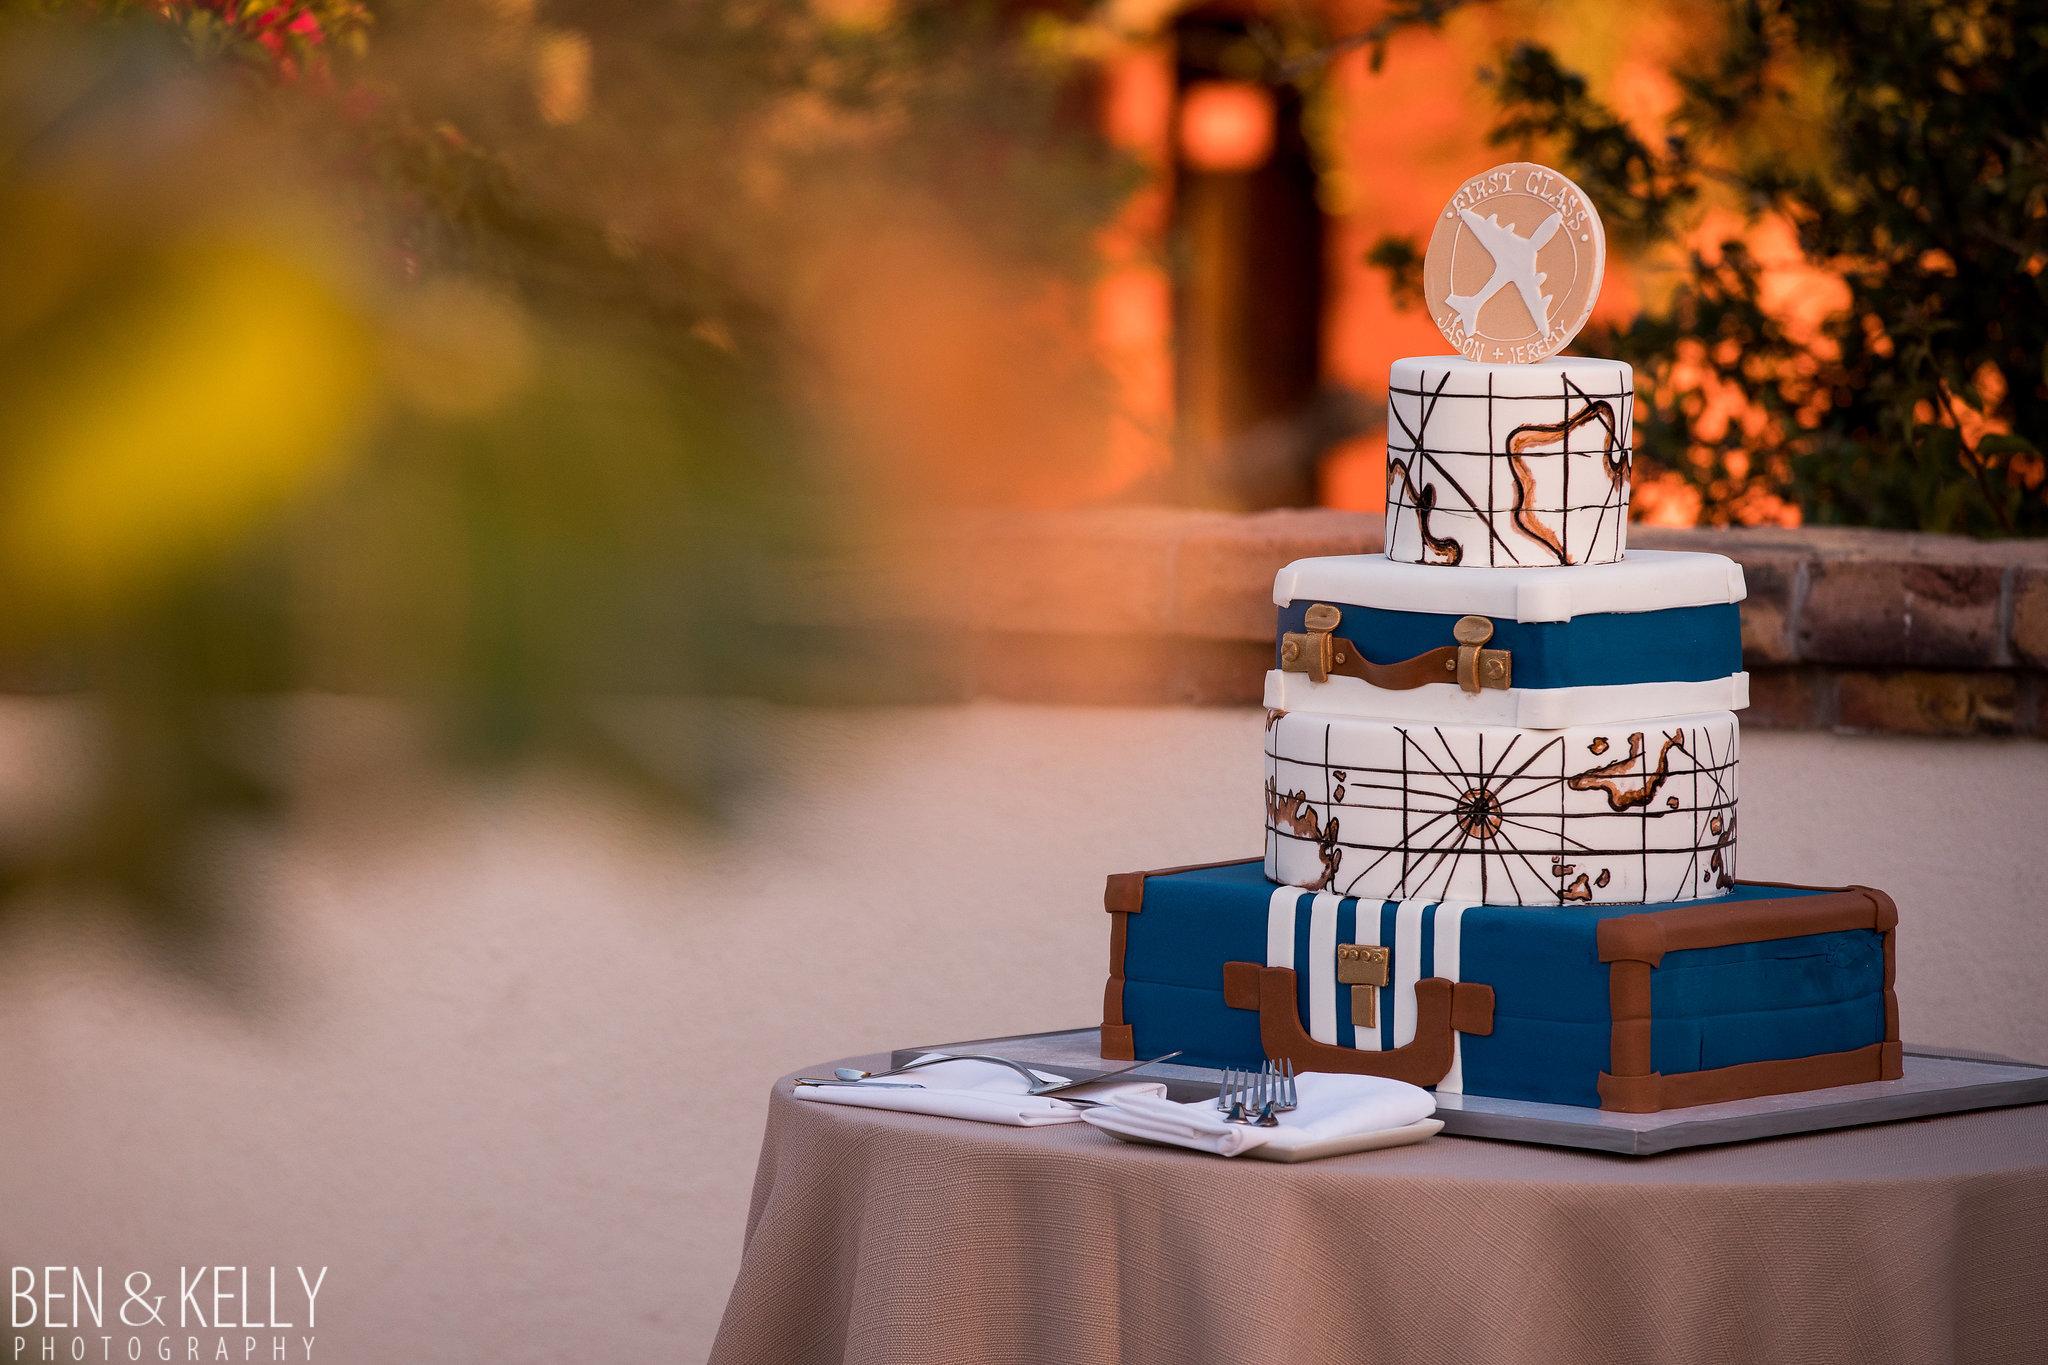 35 wedding cake custom wedding cake travel theme wedding cake suitcase wedding cake map wedding cake personalized wedding cake Life Design Events photo by Ben and Kelly Photography.jpg